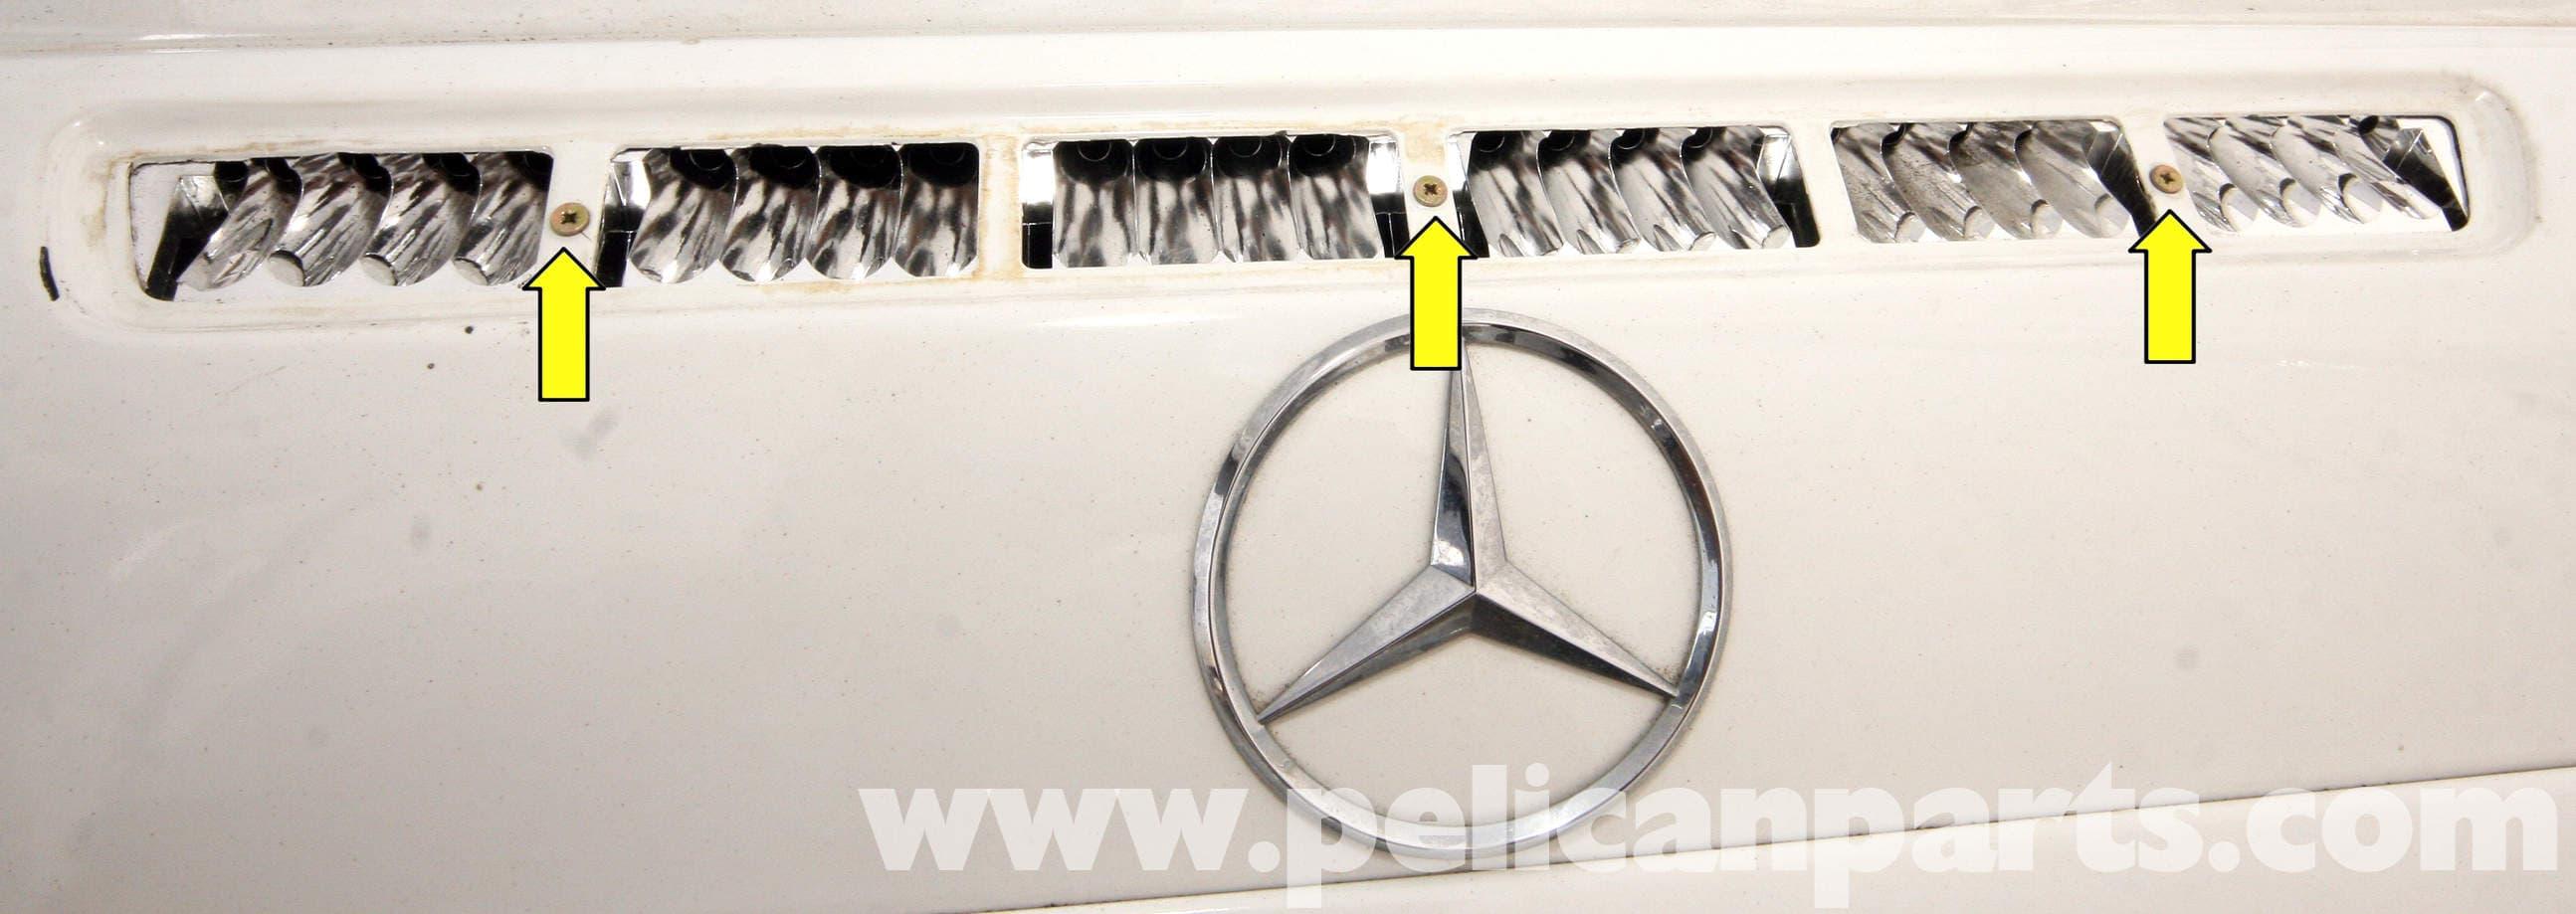 Mercedes Benz Slk 230 Third Brake Light Replacement 1998 2004 Dash Symbols Large Image Extra